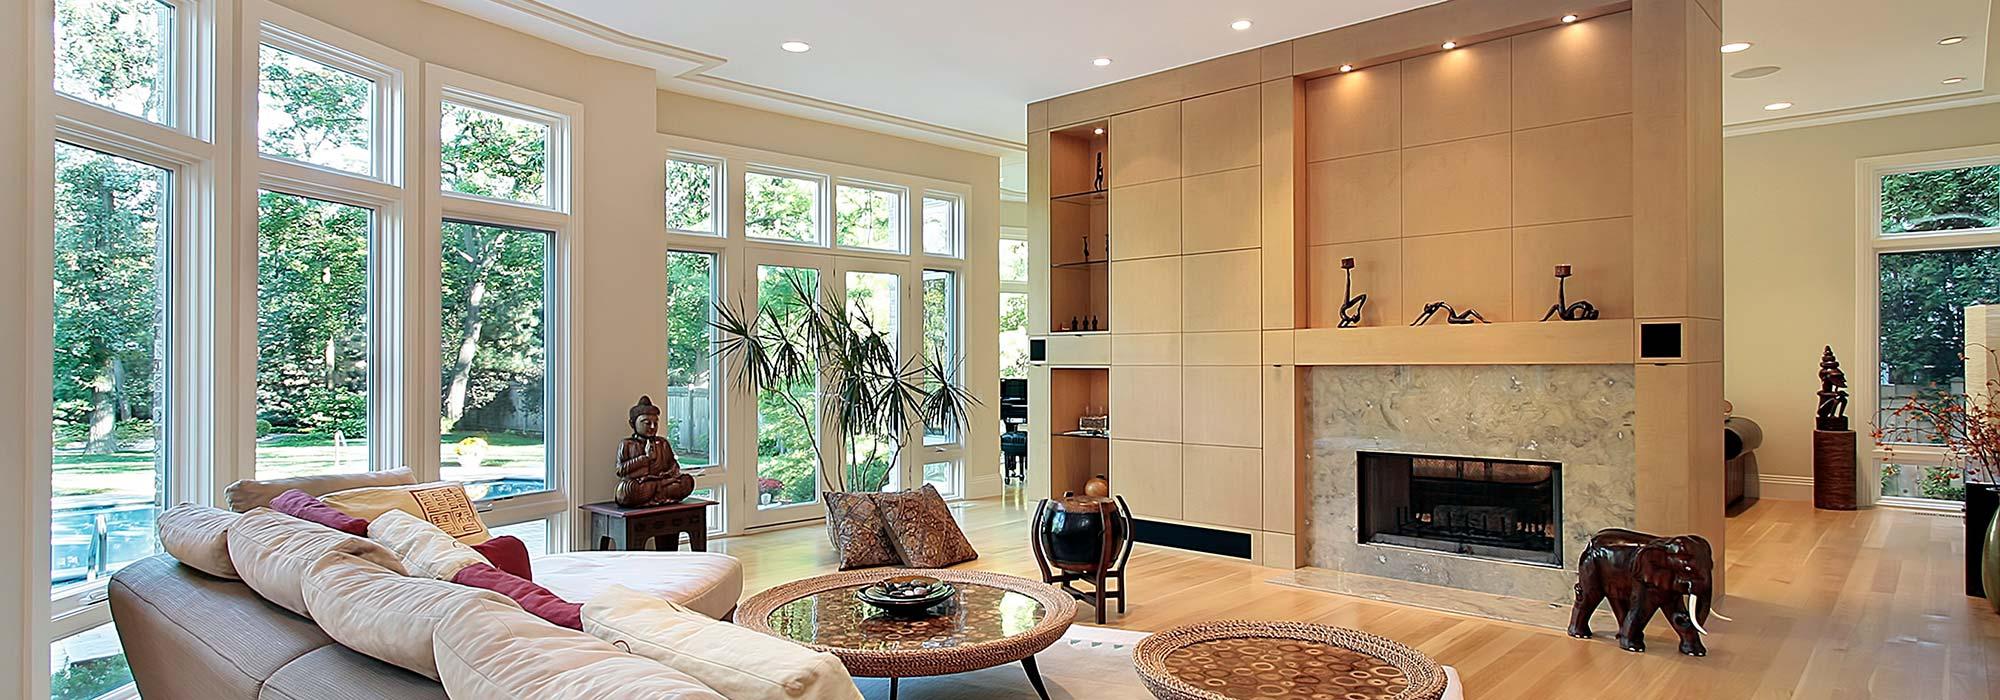 Luxurious Room & Windows